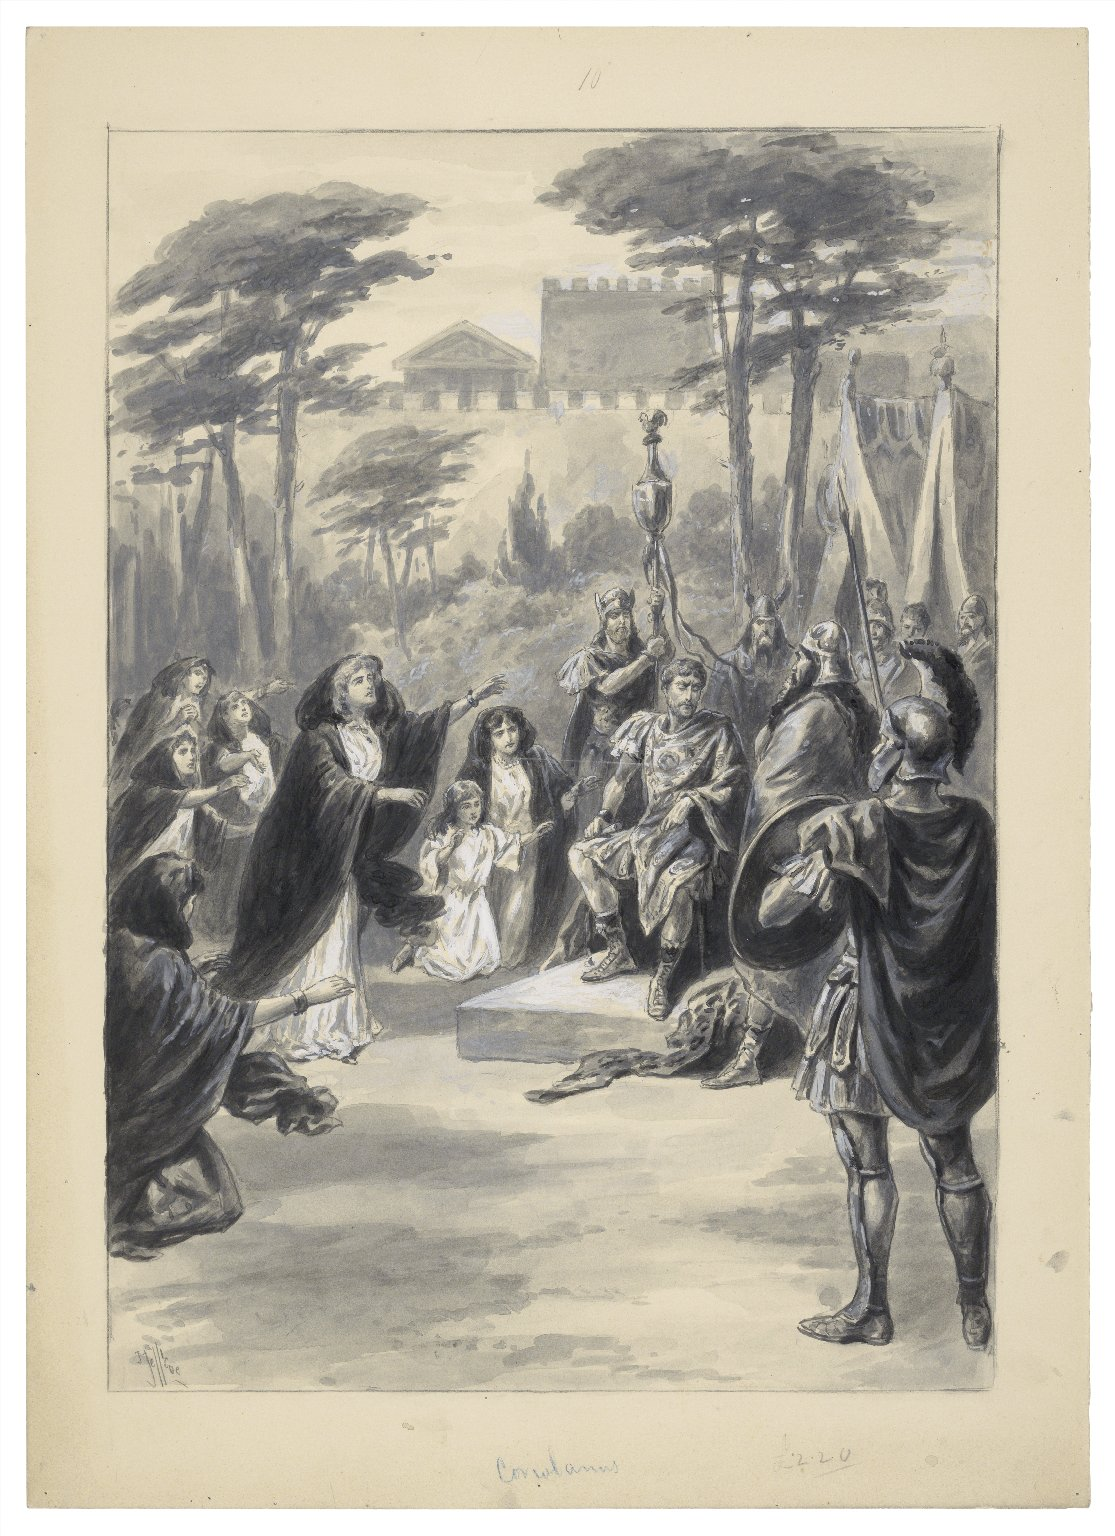 Coriolanus [graphic] / J. Jellicoe.